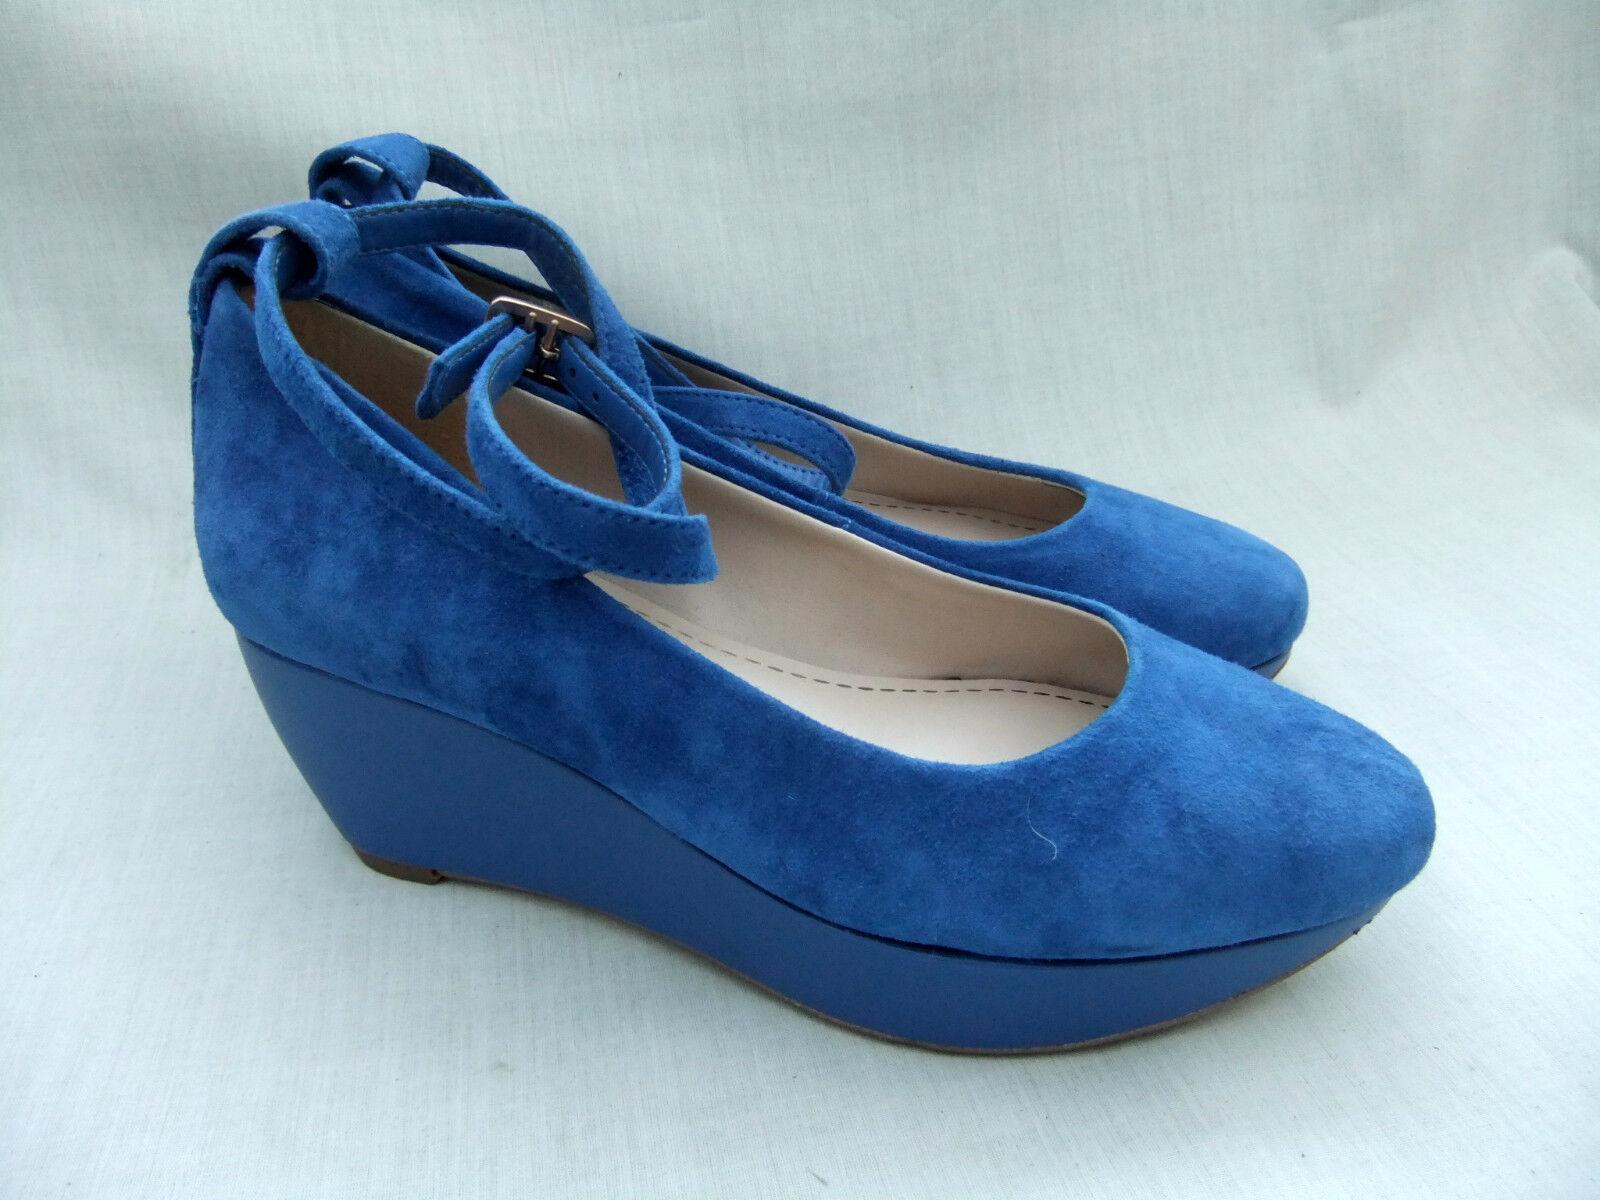 NEW CLARKS EMERY RETRO WOMENS COBALT blueE SUEDE PLATFORM SHOES SIZE 4.5   37.5